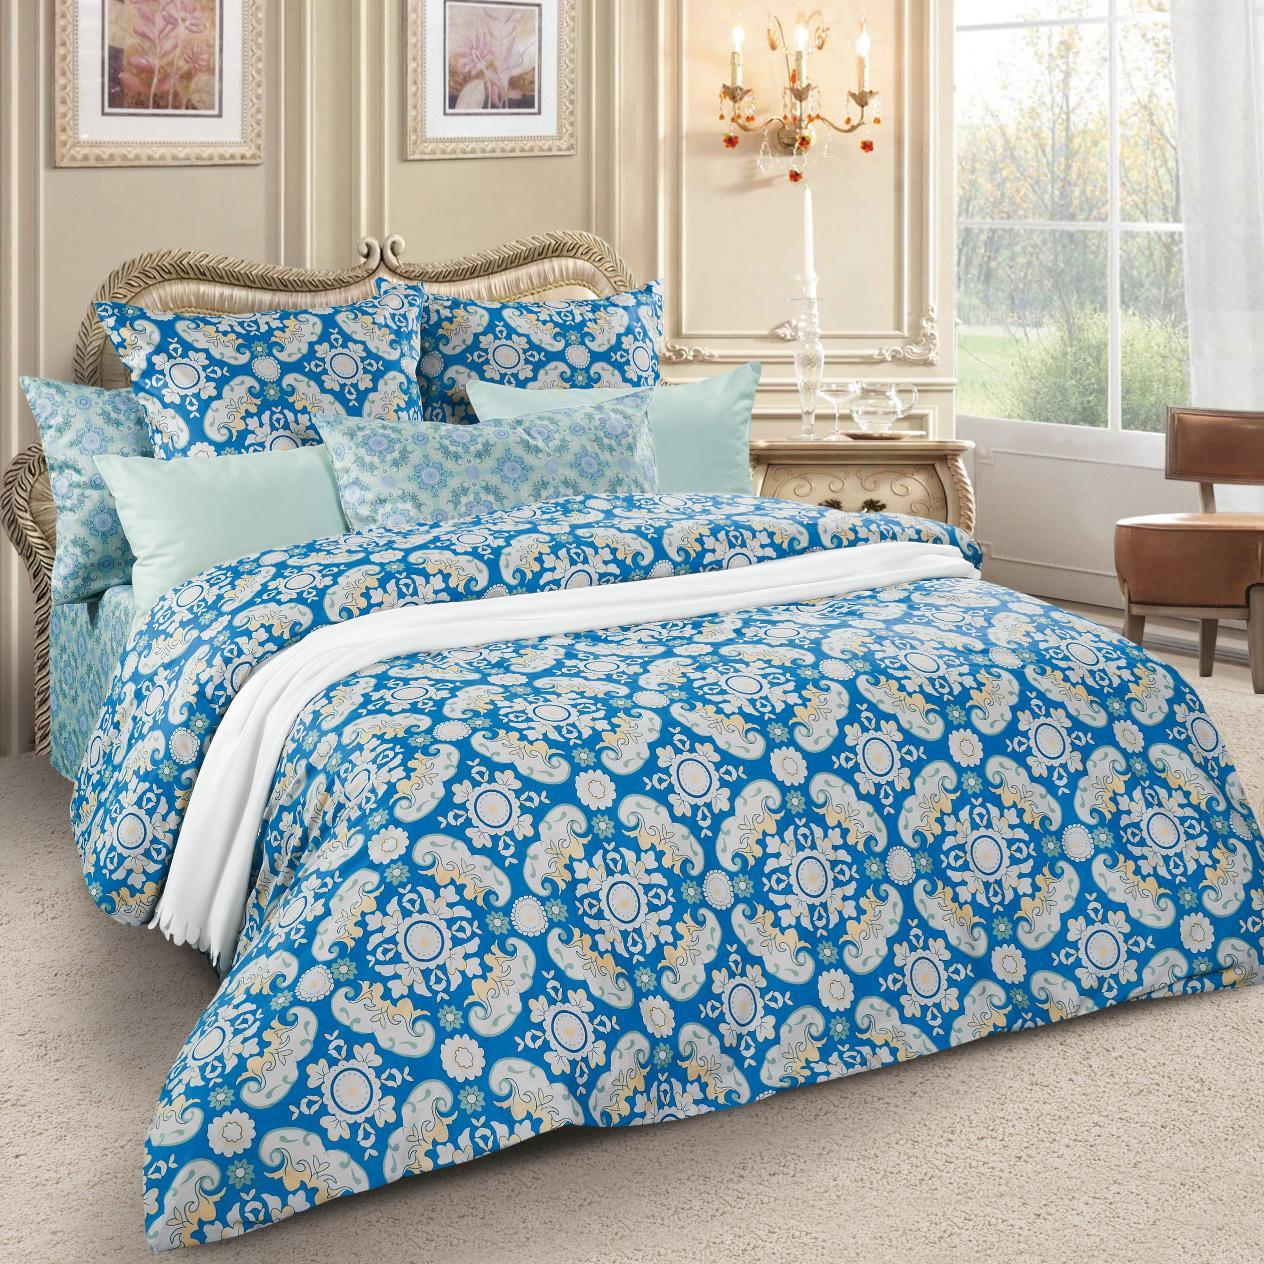 Комплект белья Letto, семейный, наволочки 70х70, цвет: синий. sm59-7 комплект белья letto дуэт семейный наволочки 70х70 цвет голубой b33 7